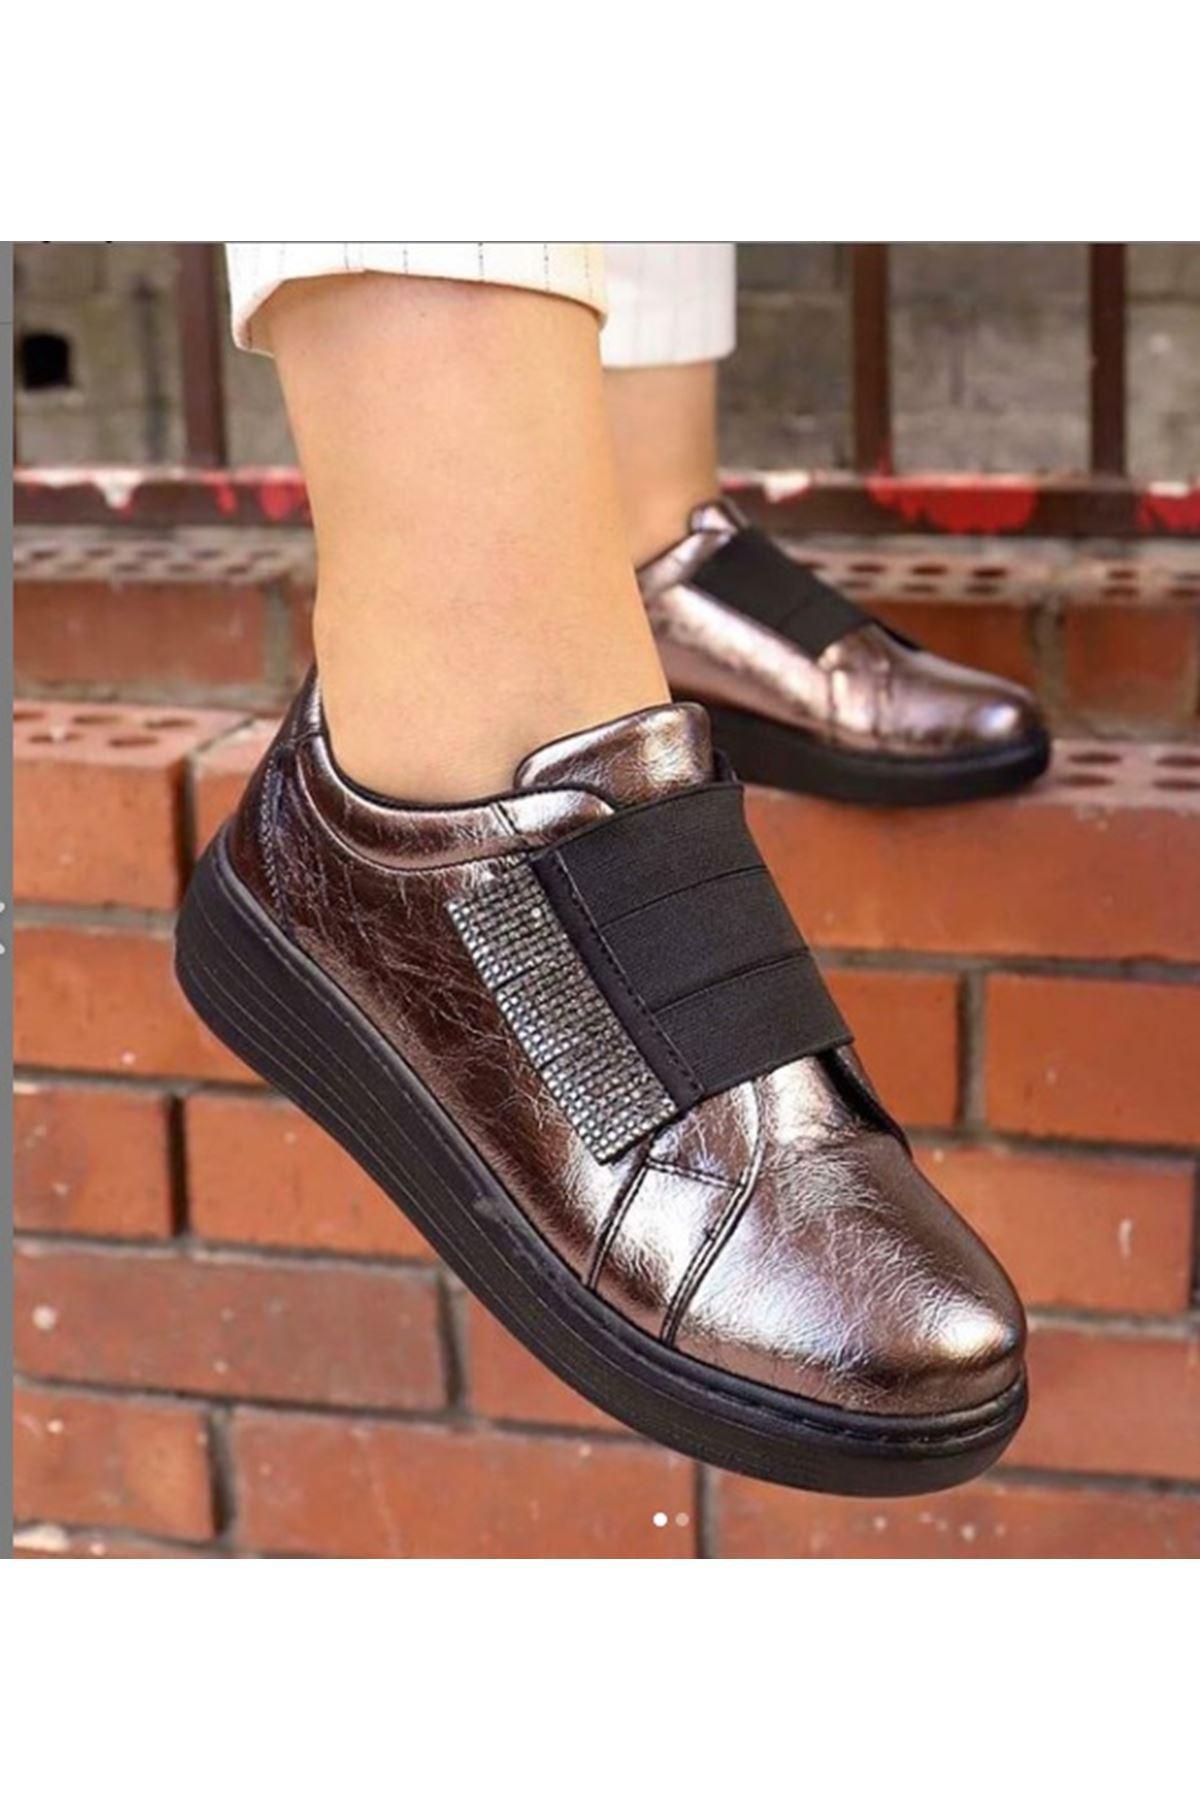 Myf-Lastik Taş Detay Spor Ayakkabı Platin